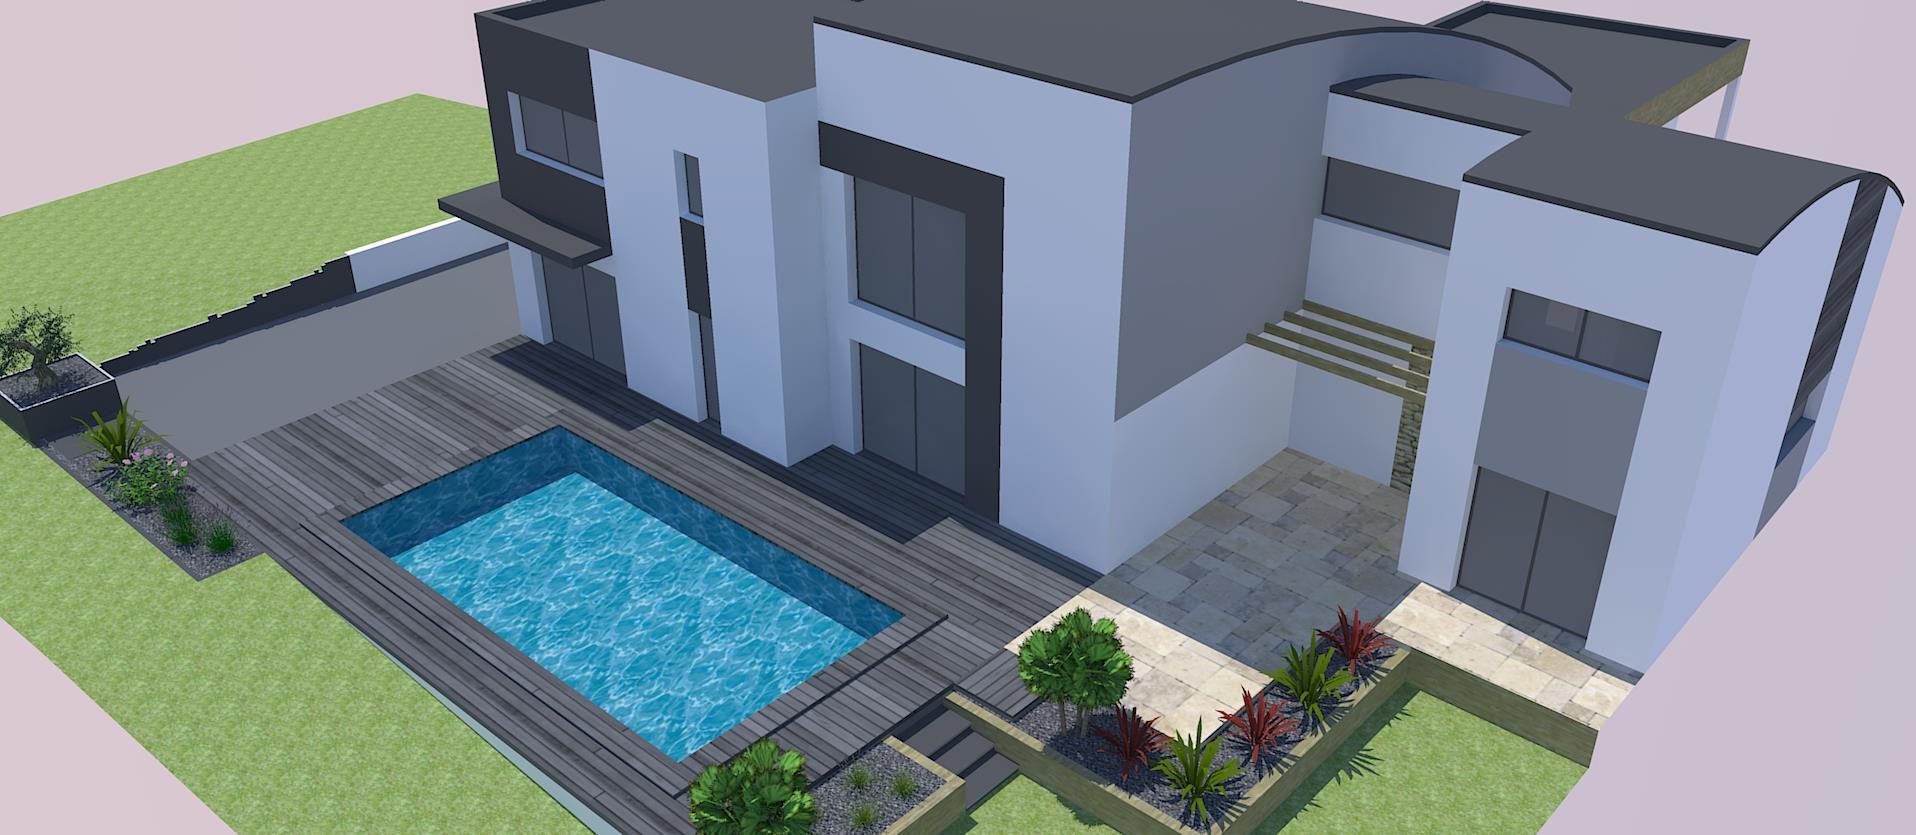 etude et conception pascal morice paysage. Black Bedroom Furniture Sets. Home Design Ideas